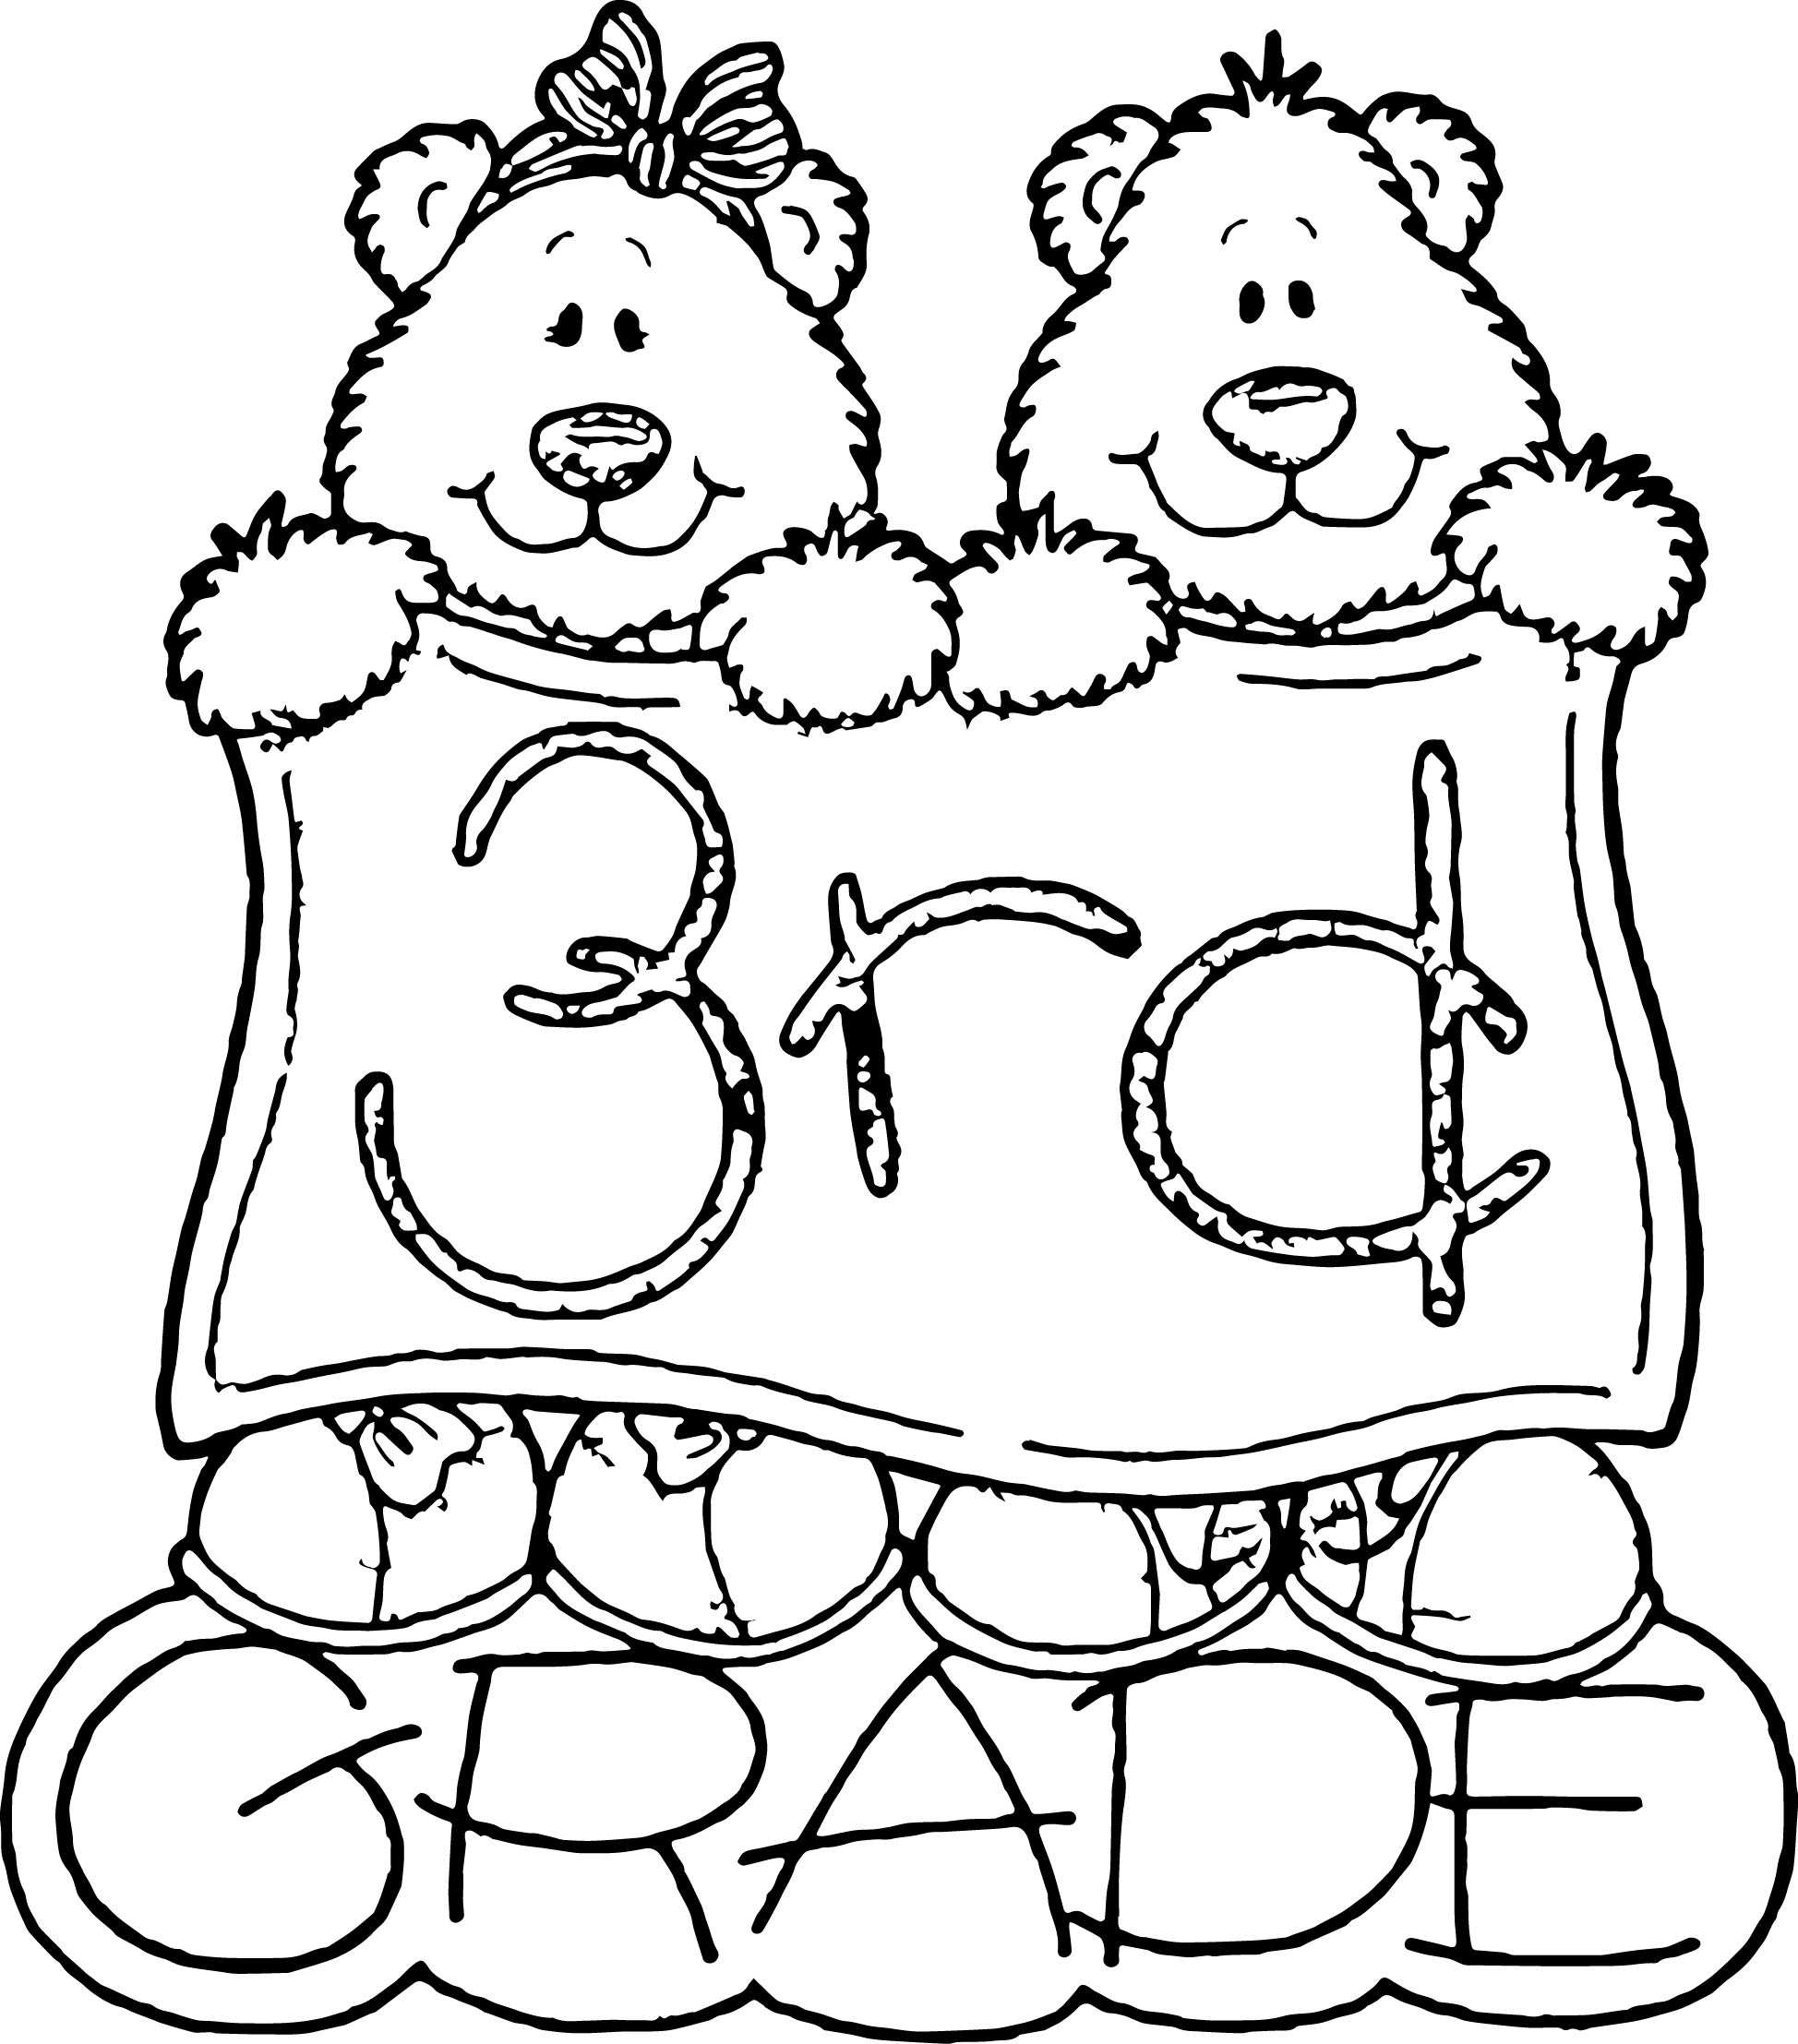 Third Grade Bears Coloring Page